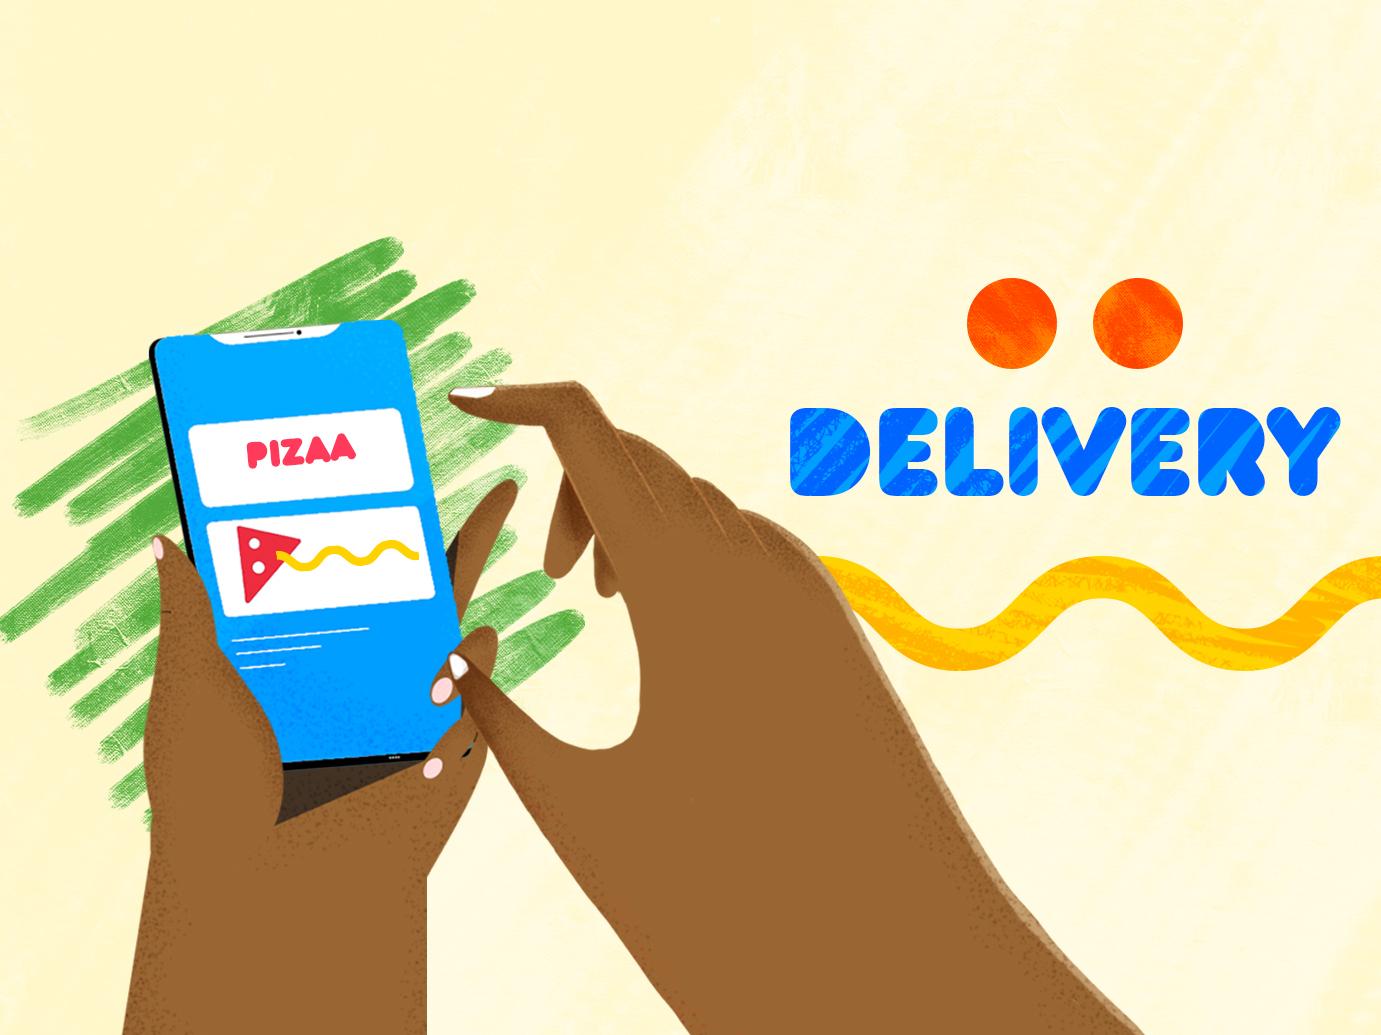 Delivery app abstact app  design motion animation art flat illustration brush charactedesign animation 2d design